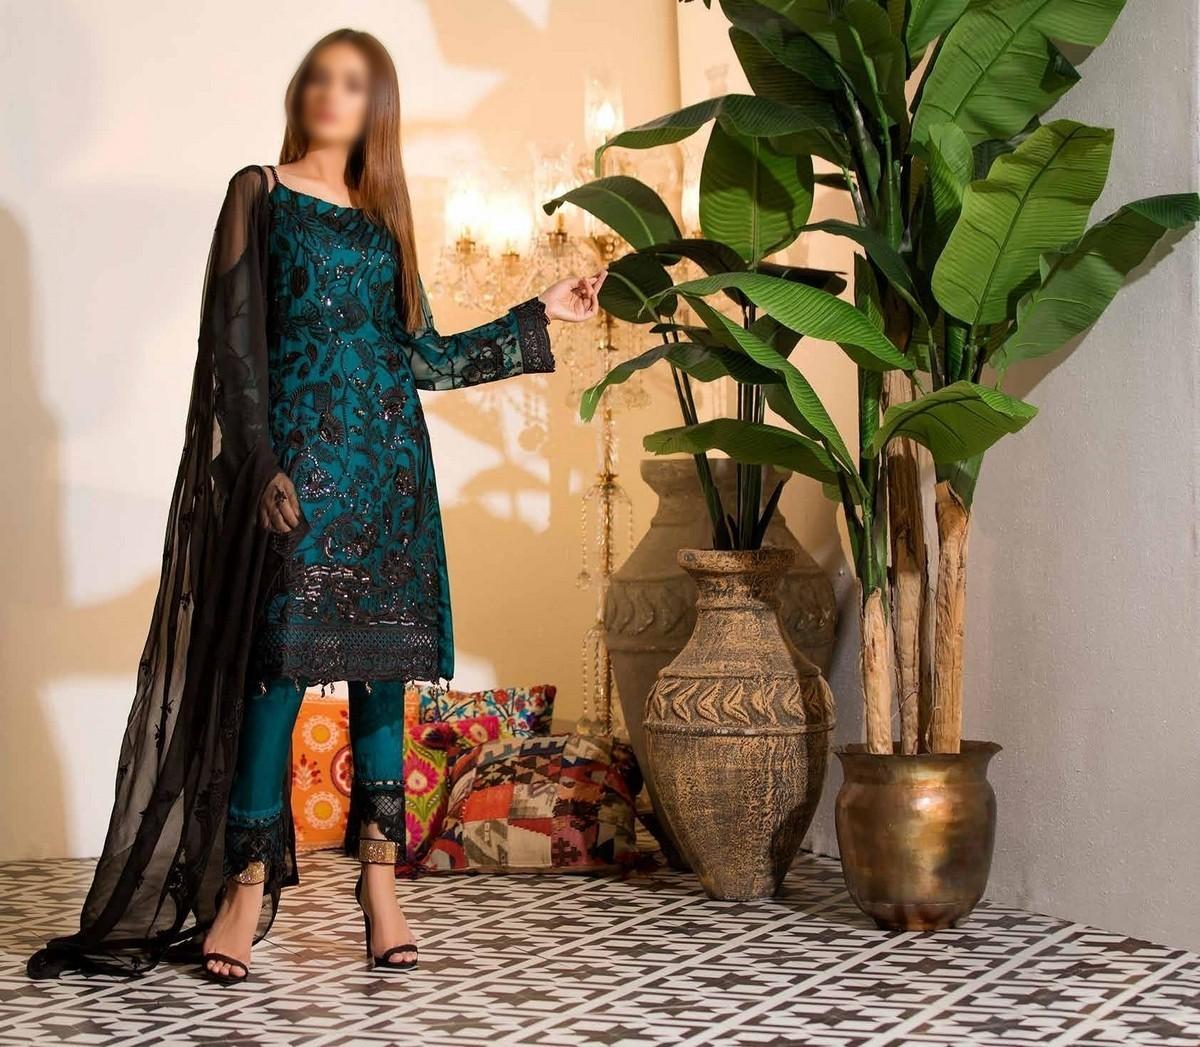 /2020/01/ramsha-clothing-clcc-v-01-d-a-101-image1.jpeg